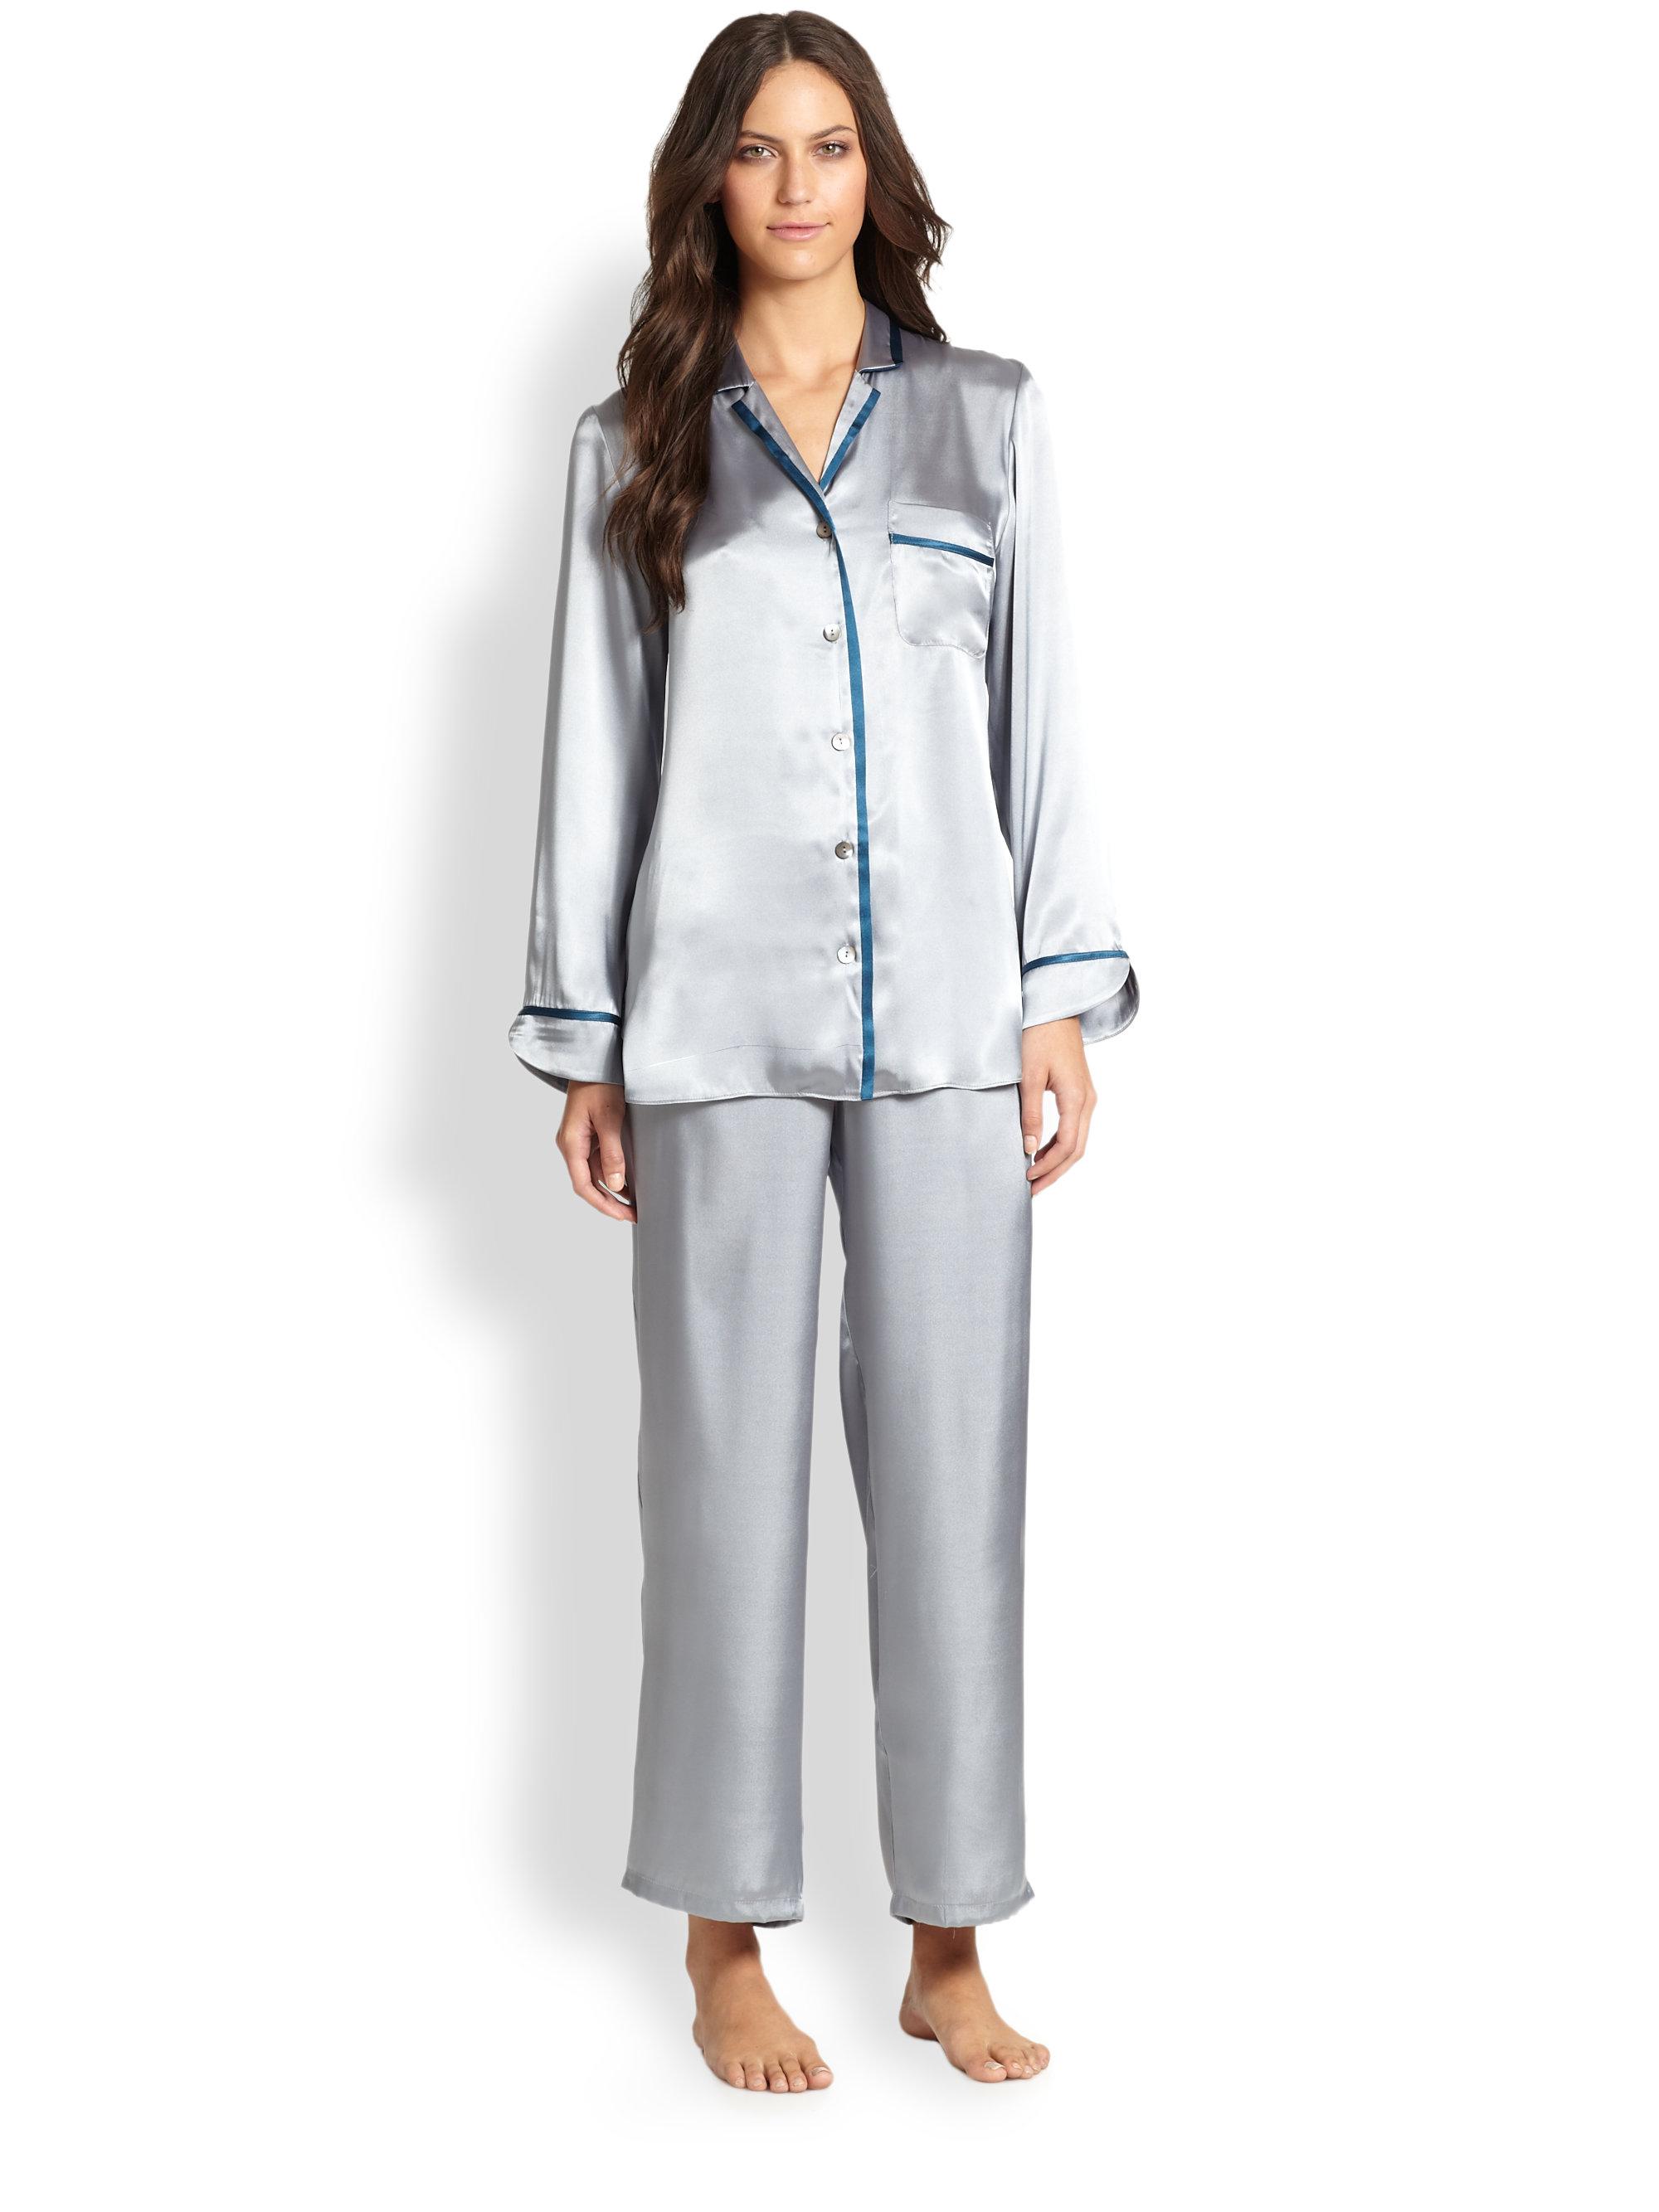 Galerry slip dress nightwear